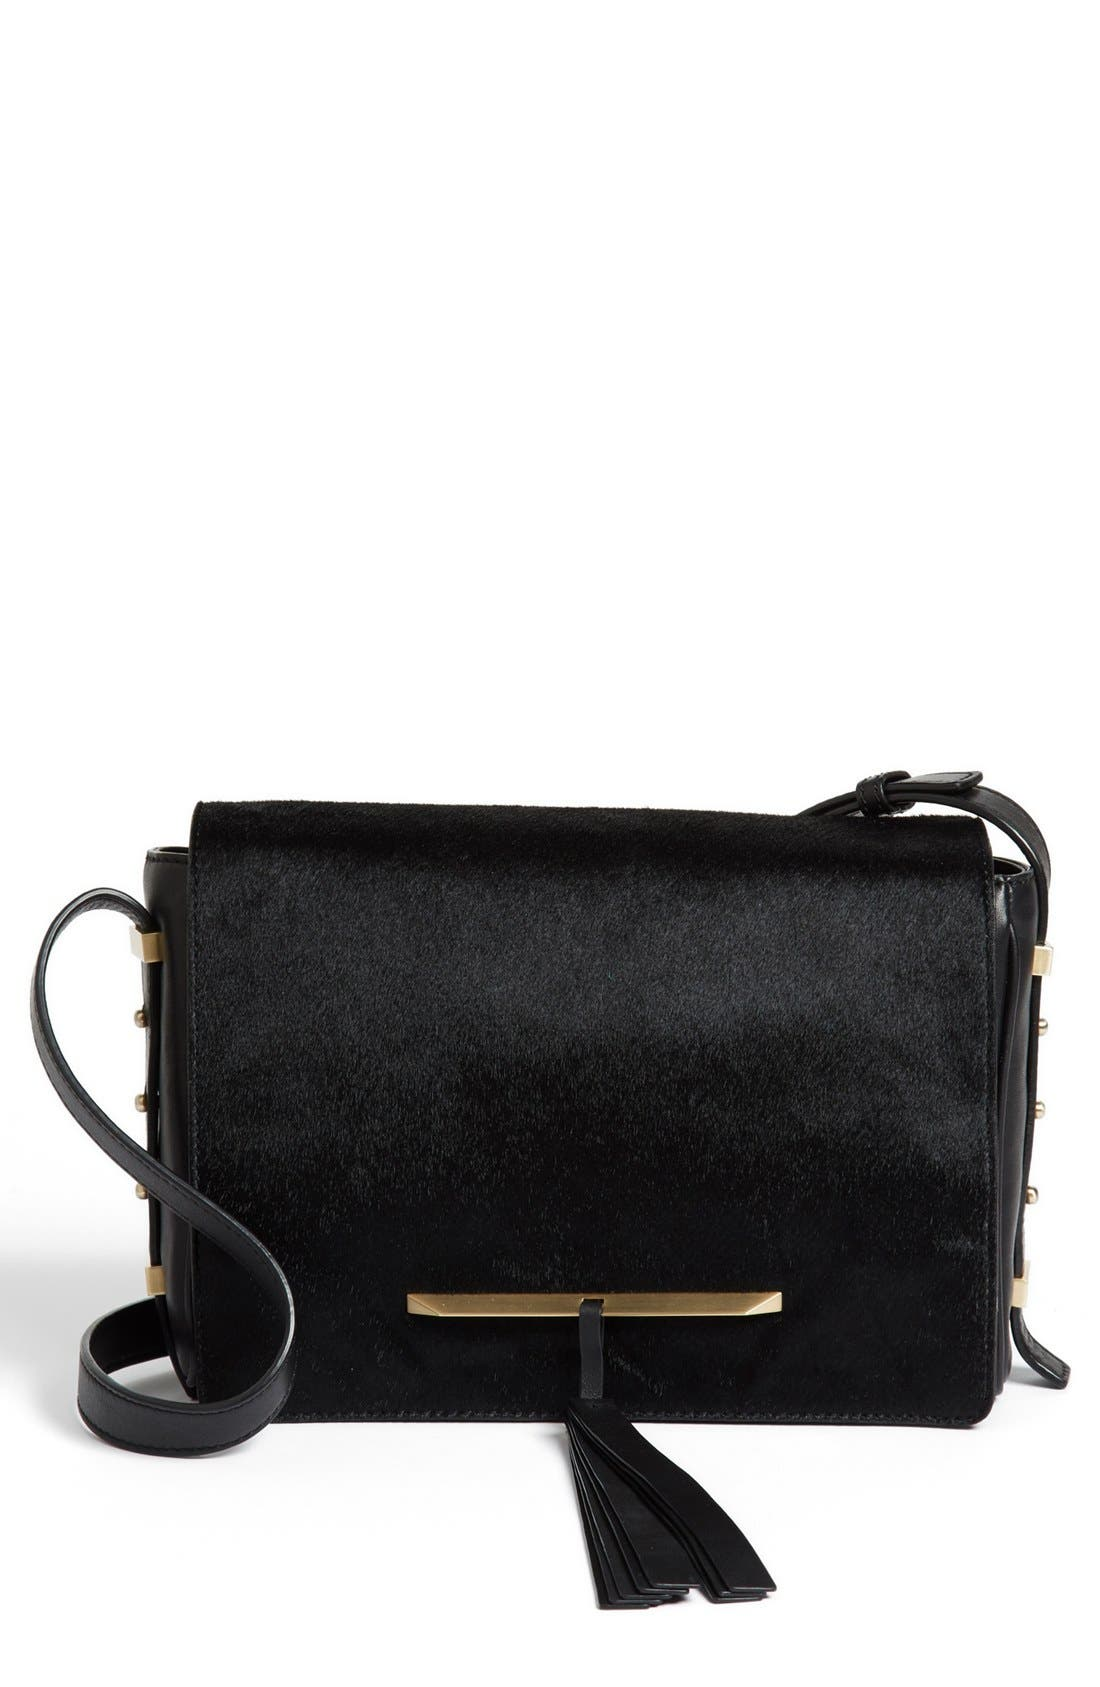 Alternate Image 1 Selected - B Brian Atwood 'Brigitte' Calf Hair Crossbody Bag, Small